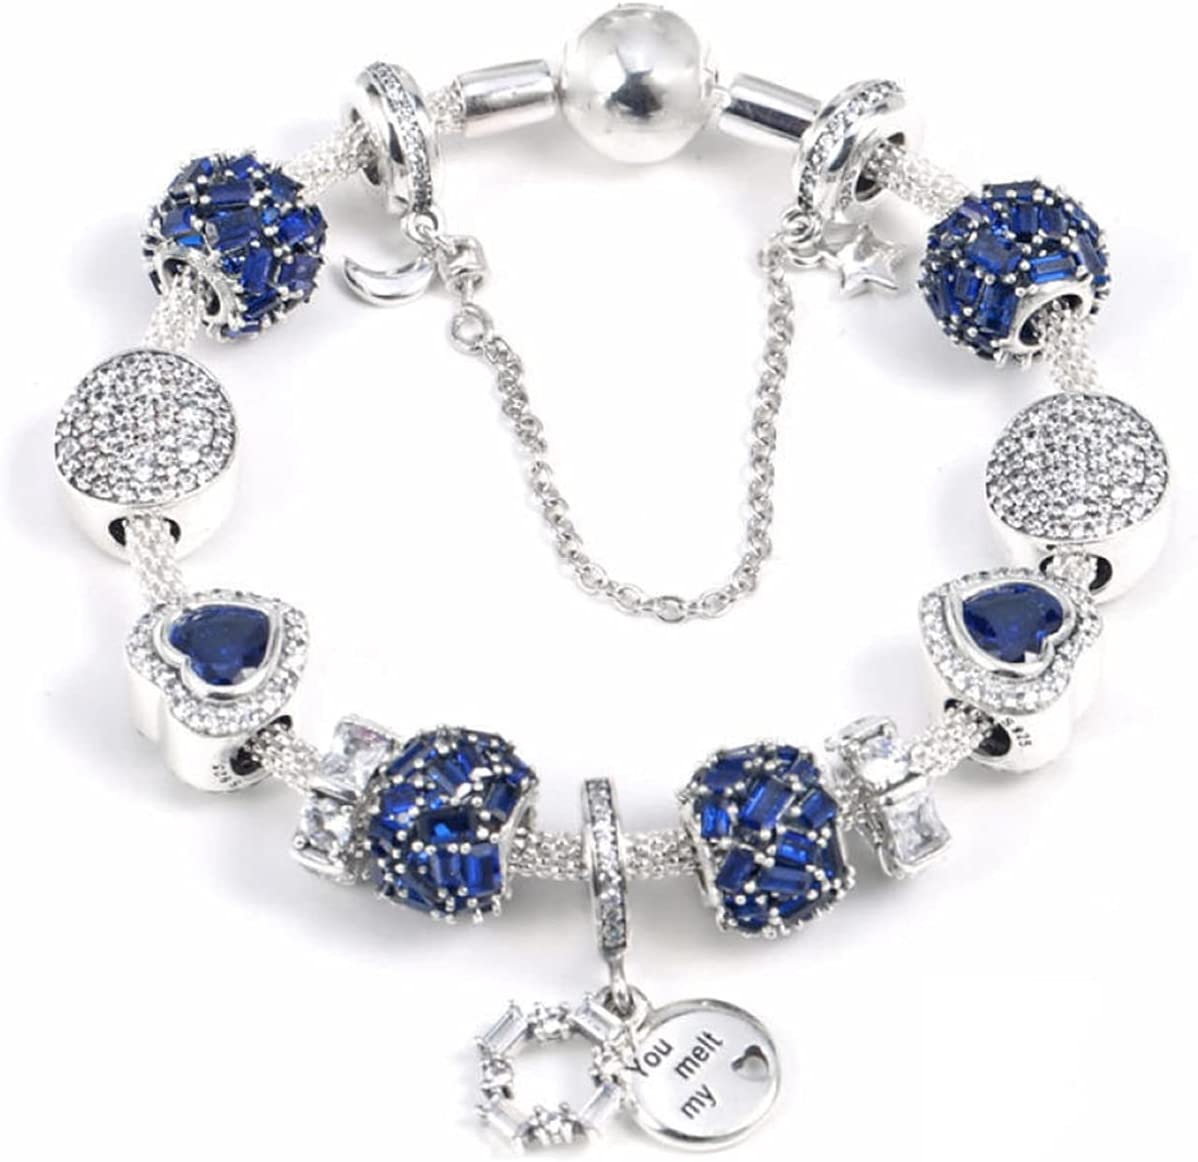 GaYouny 925 Classic Silver Fashion Shine Over item handling ☆ Winter Chain Set Bra Beauty Net